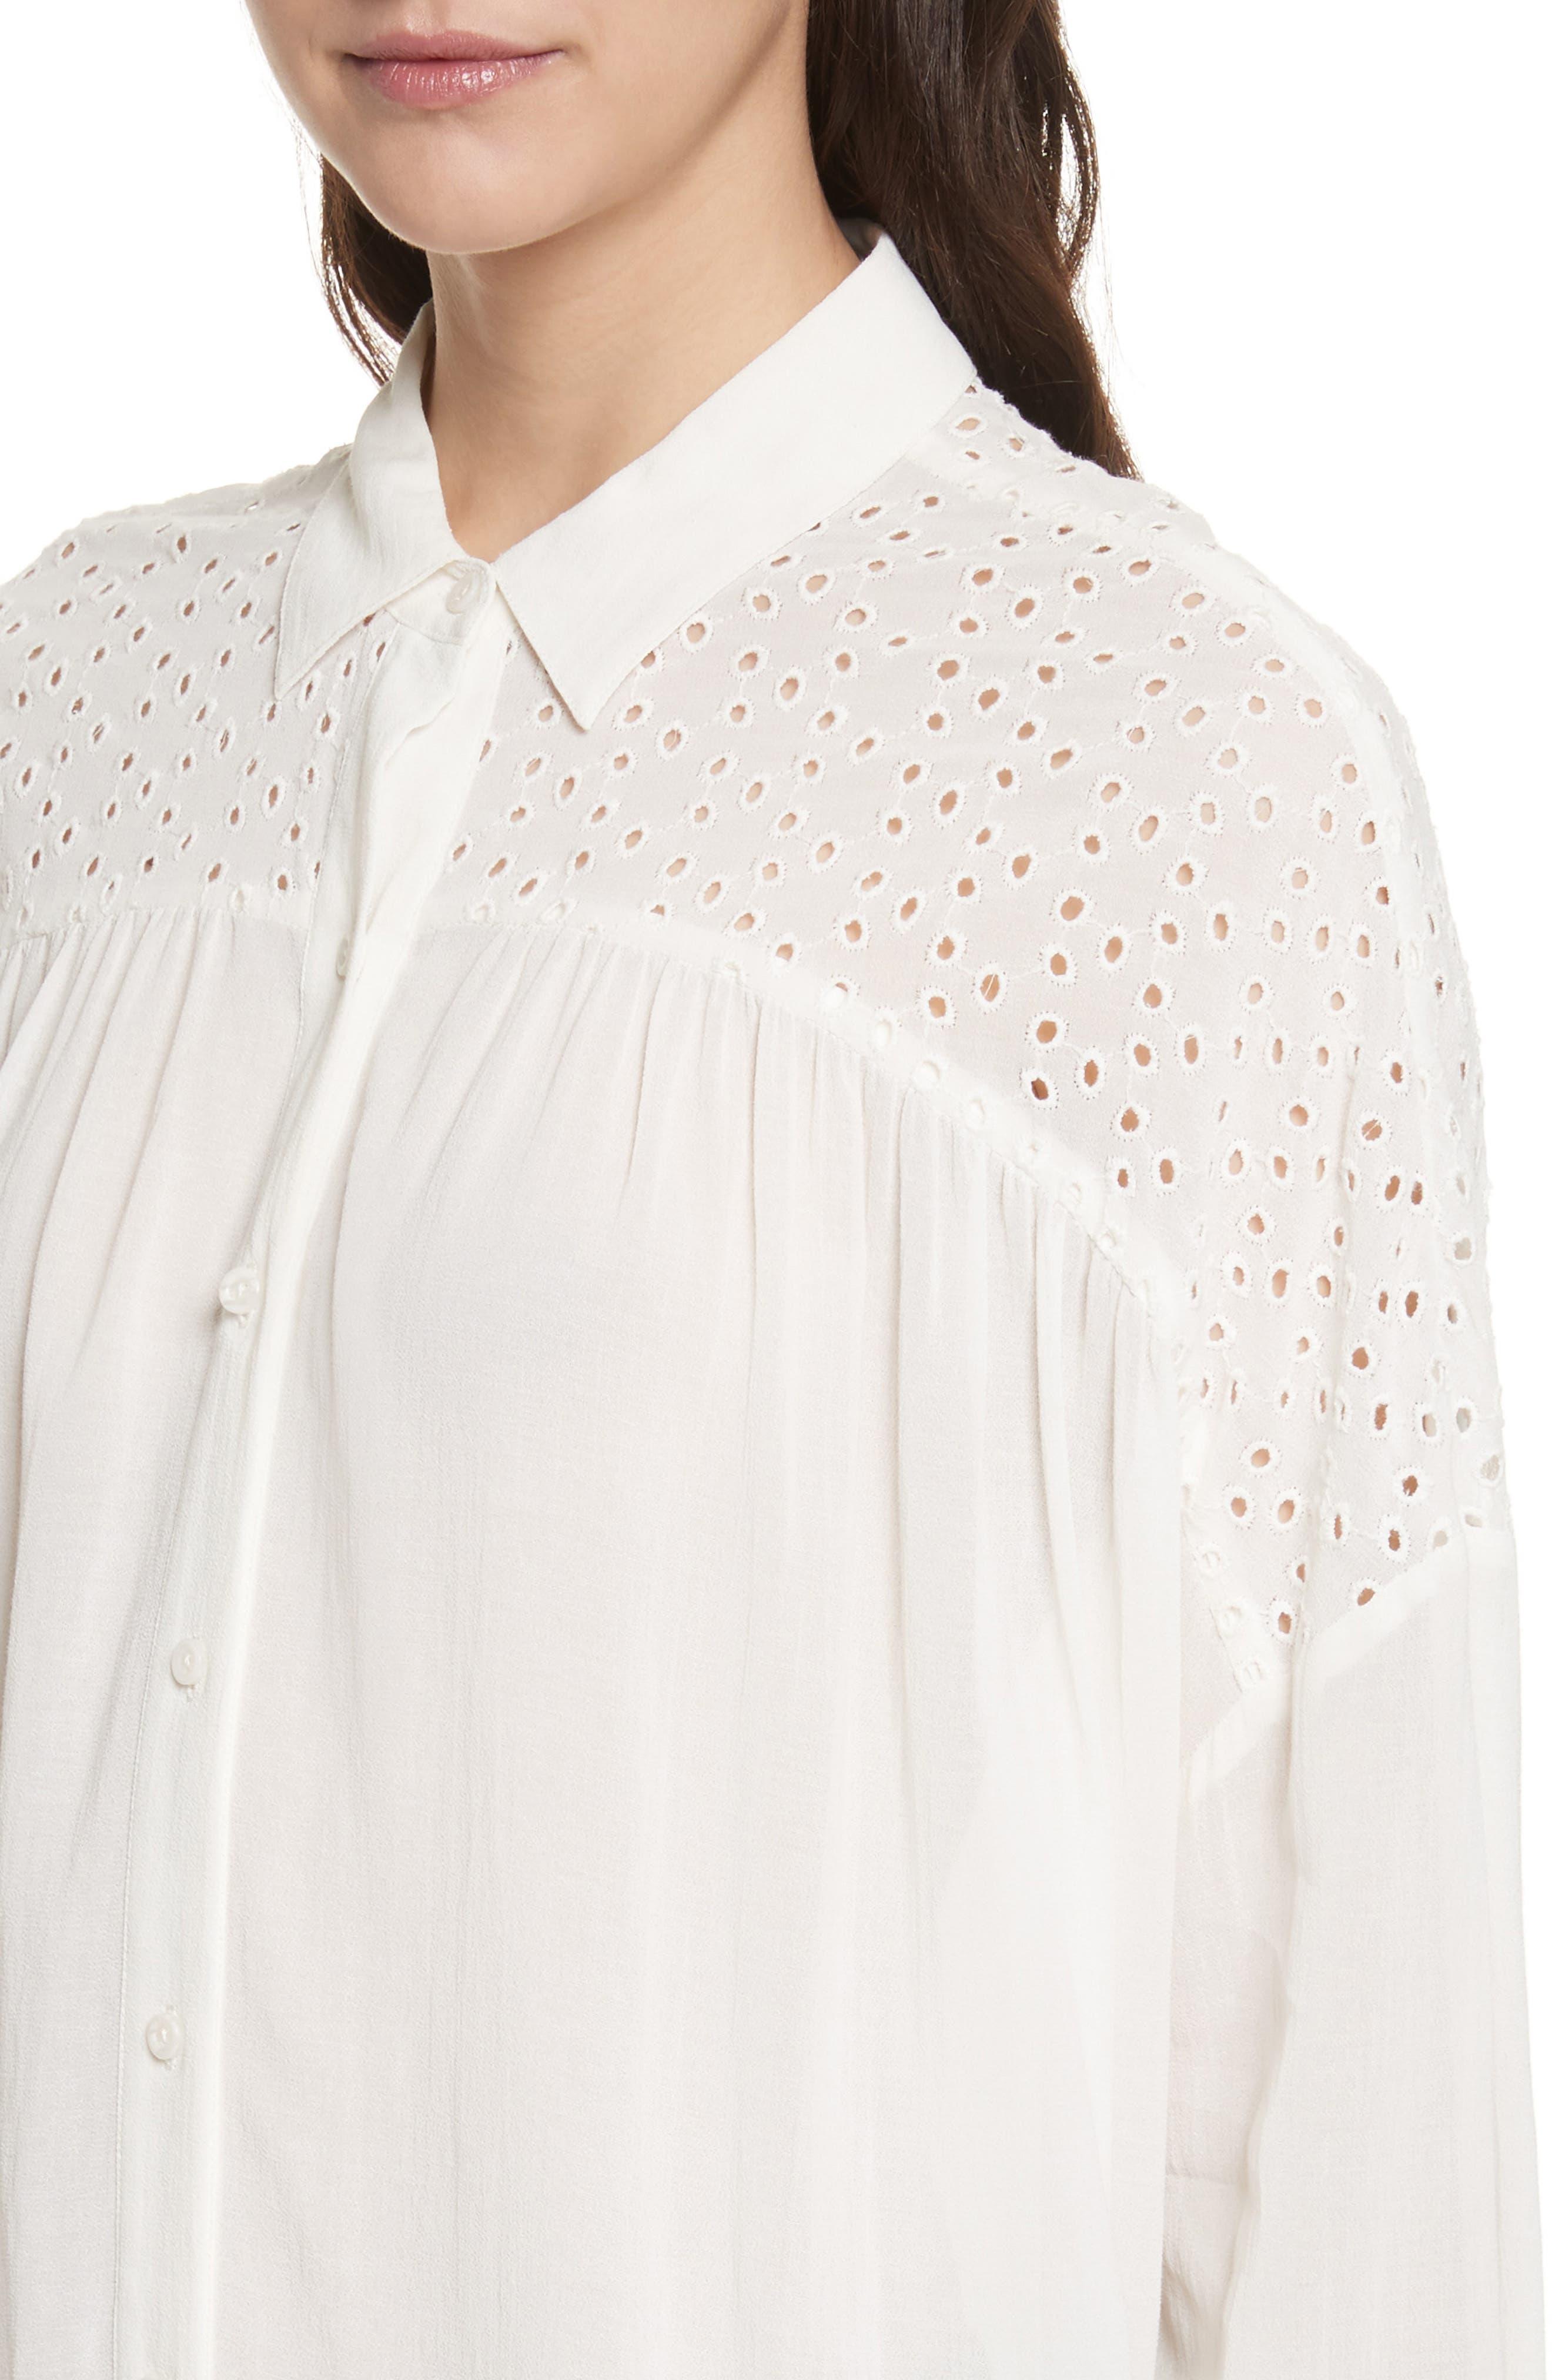 Pearla Shirt,                             Alternate thumbnail 8, color,